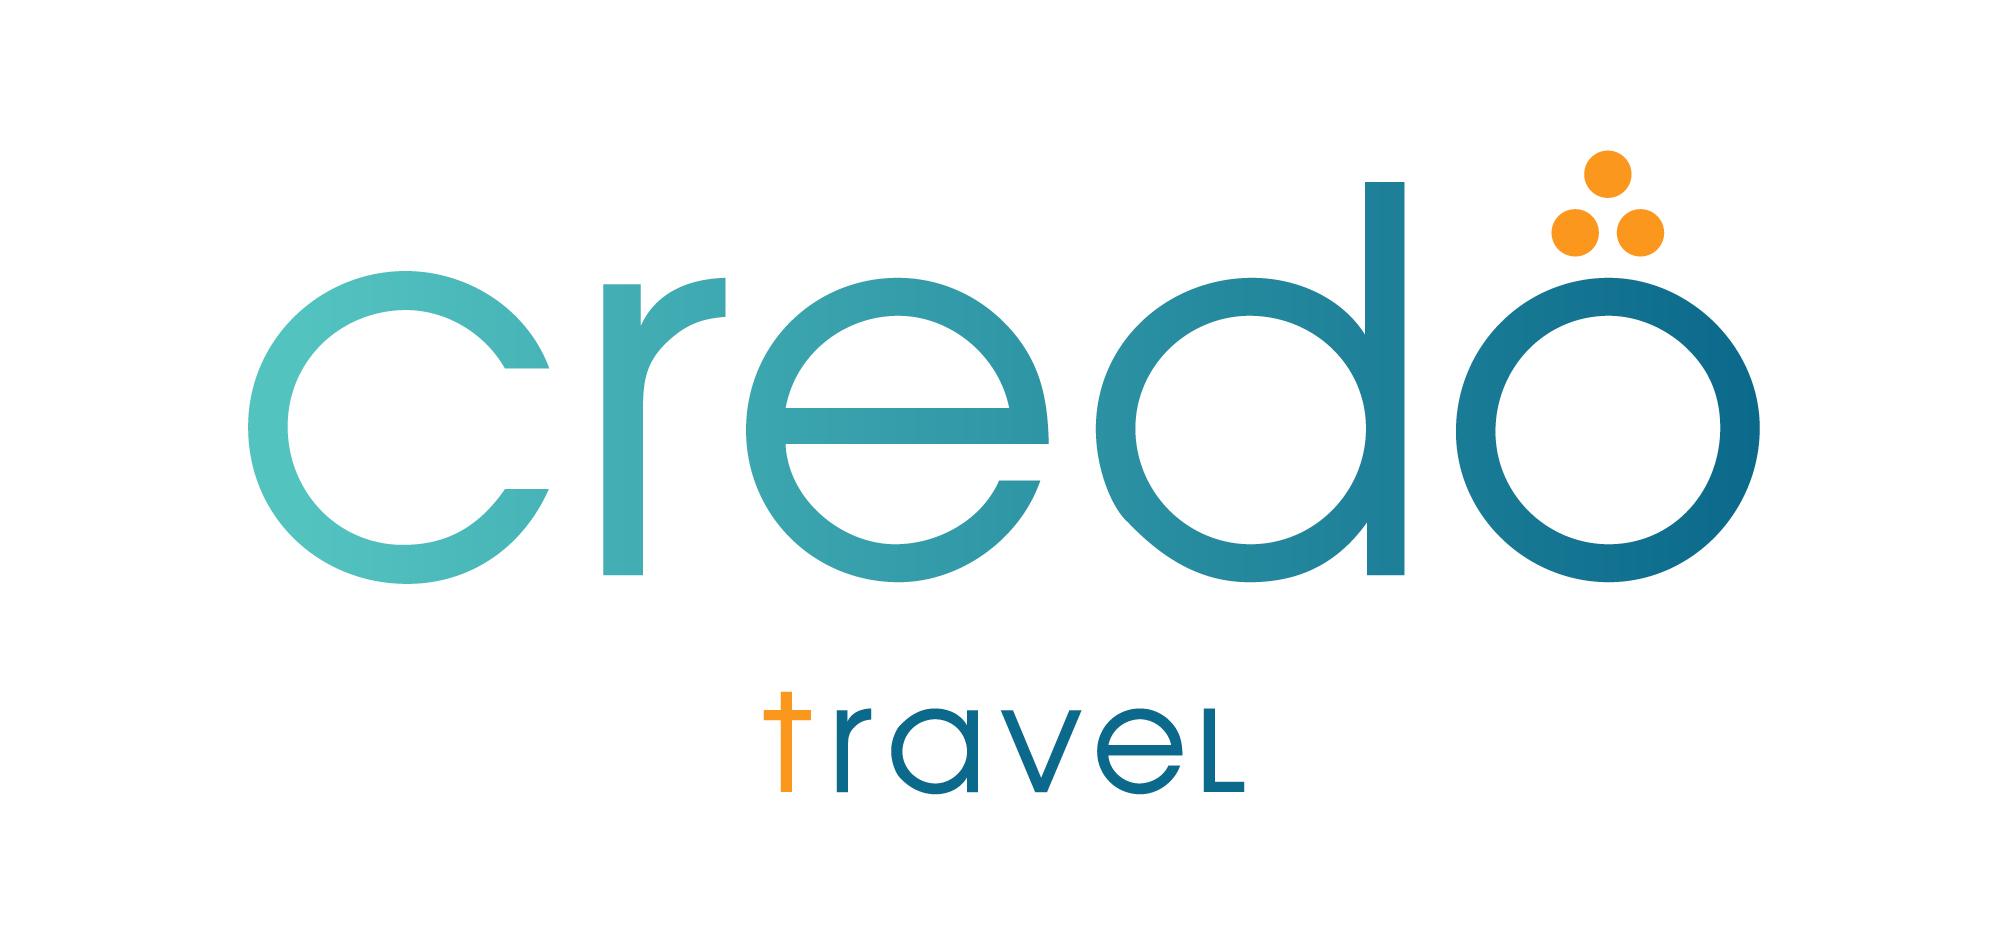 Credo travel